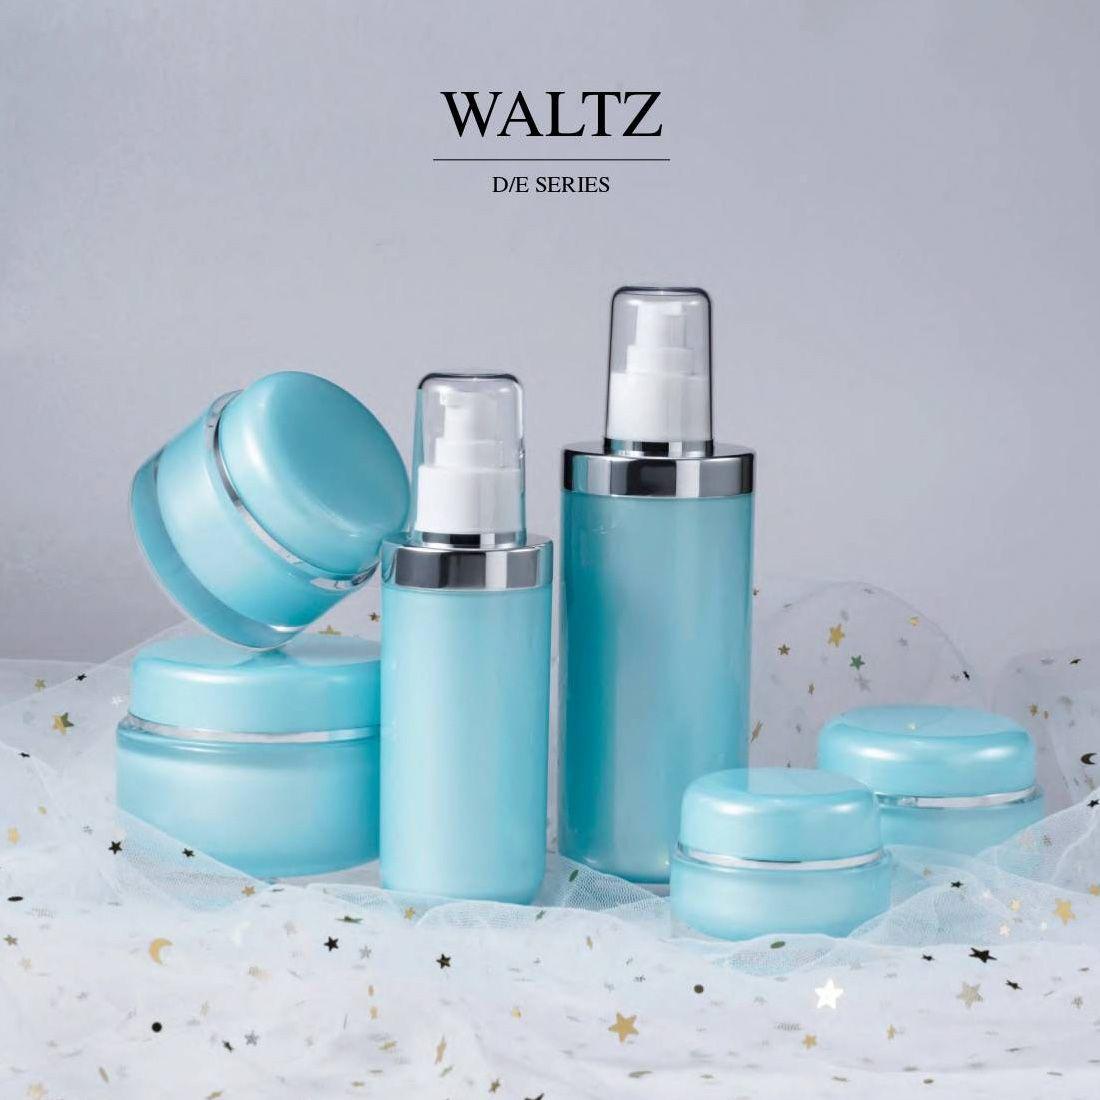 COSJAR cometic container design - Waltz series